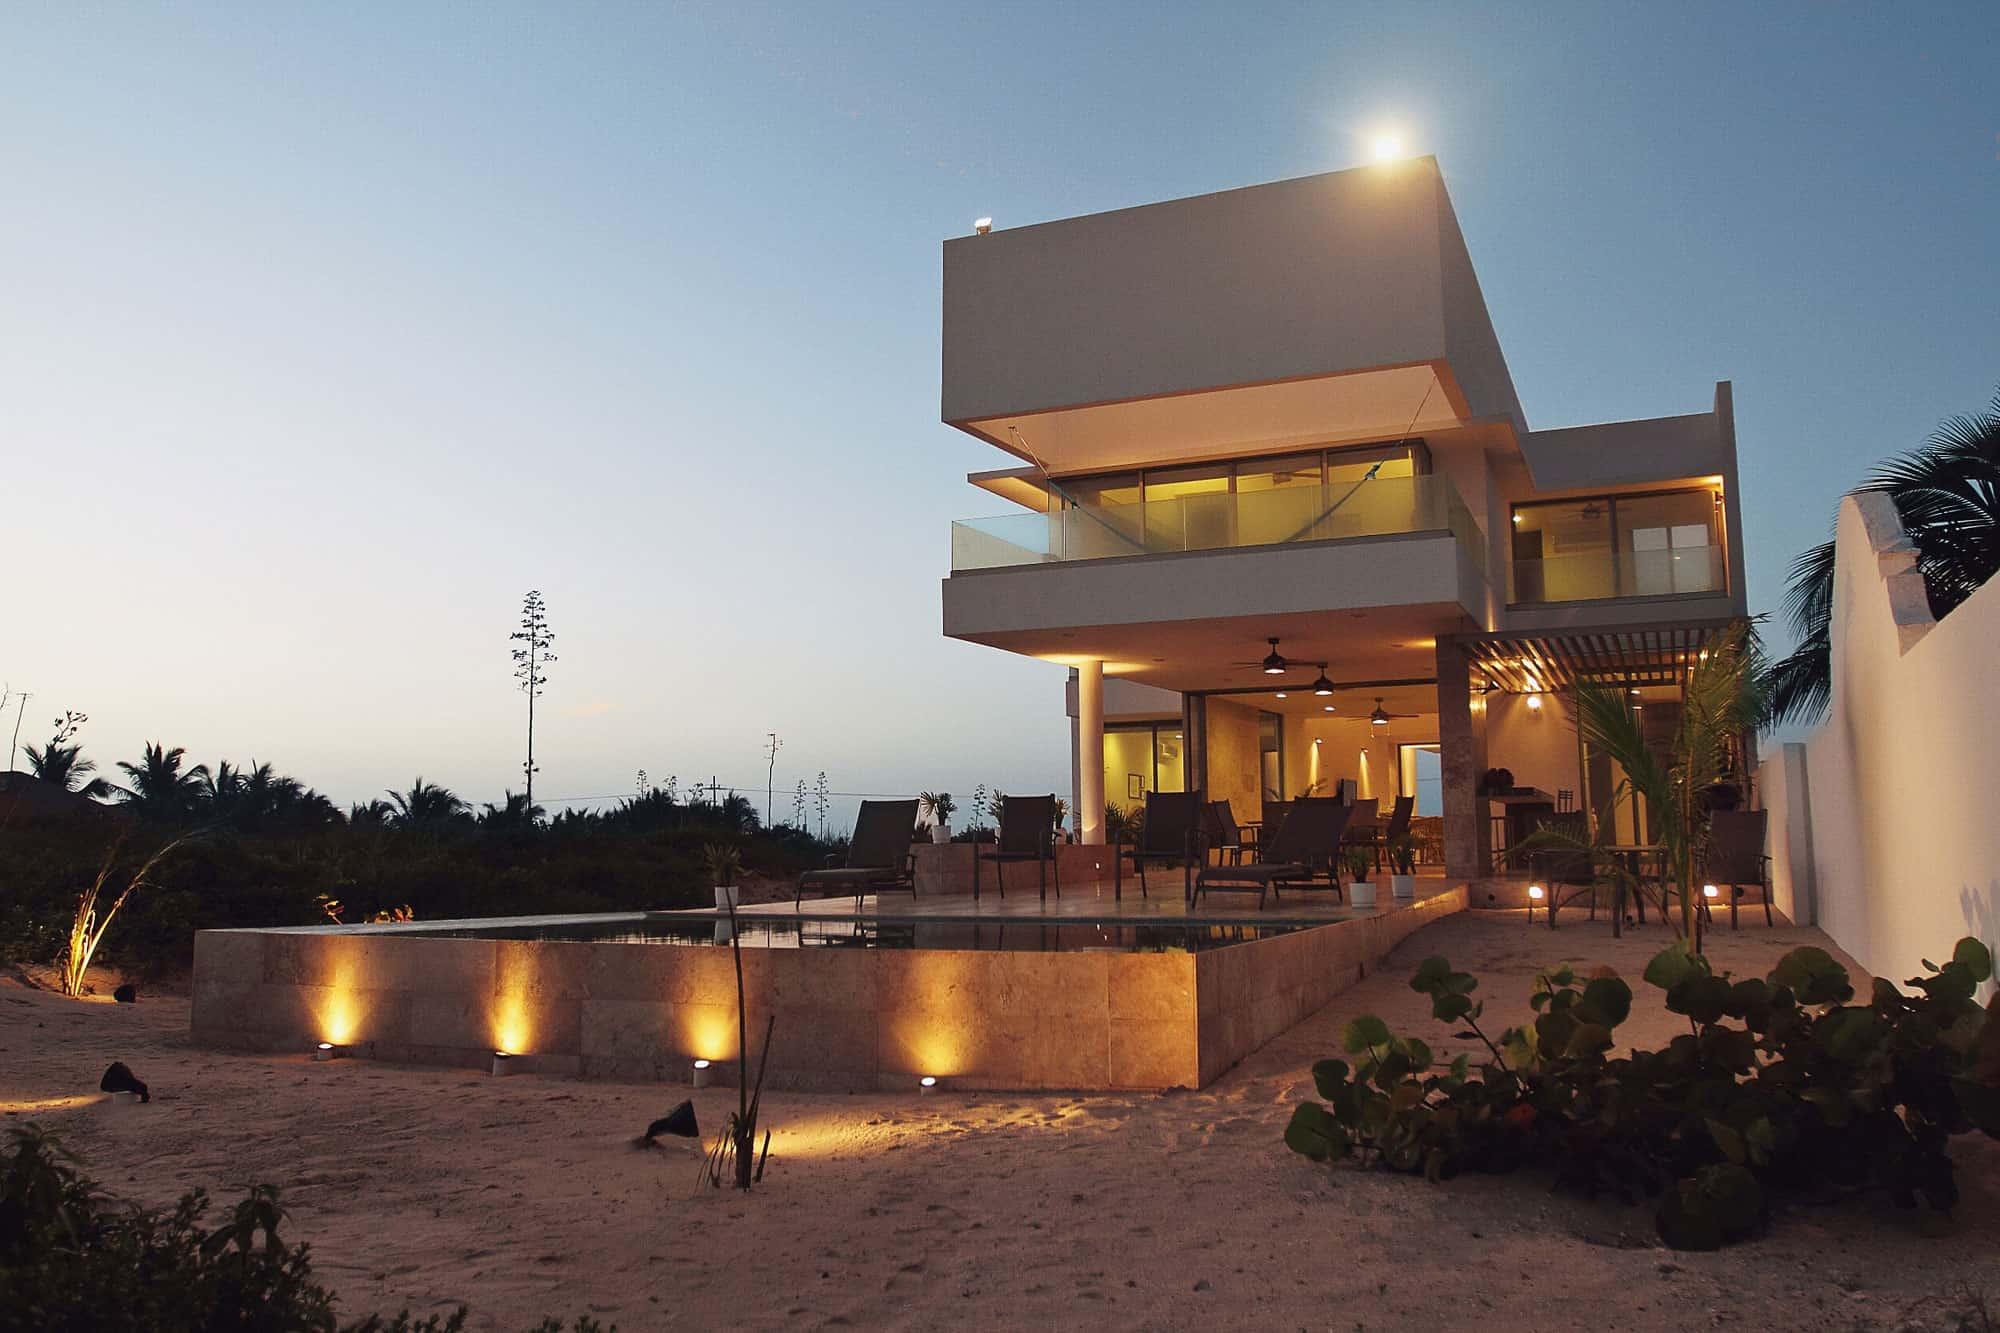 Tuunich Kanab by Seijo Peon Arquitectos (6)